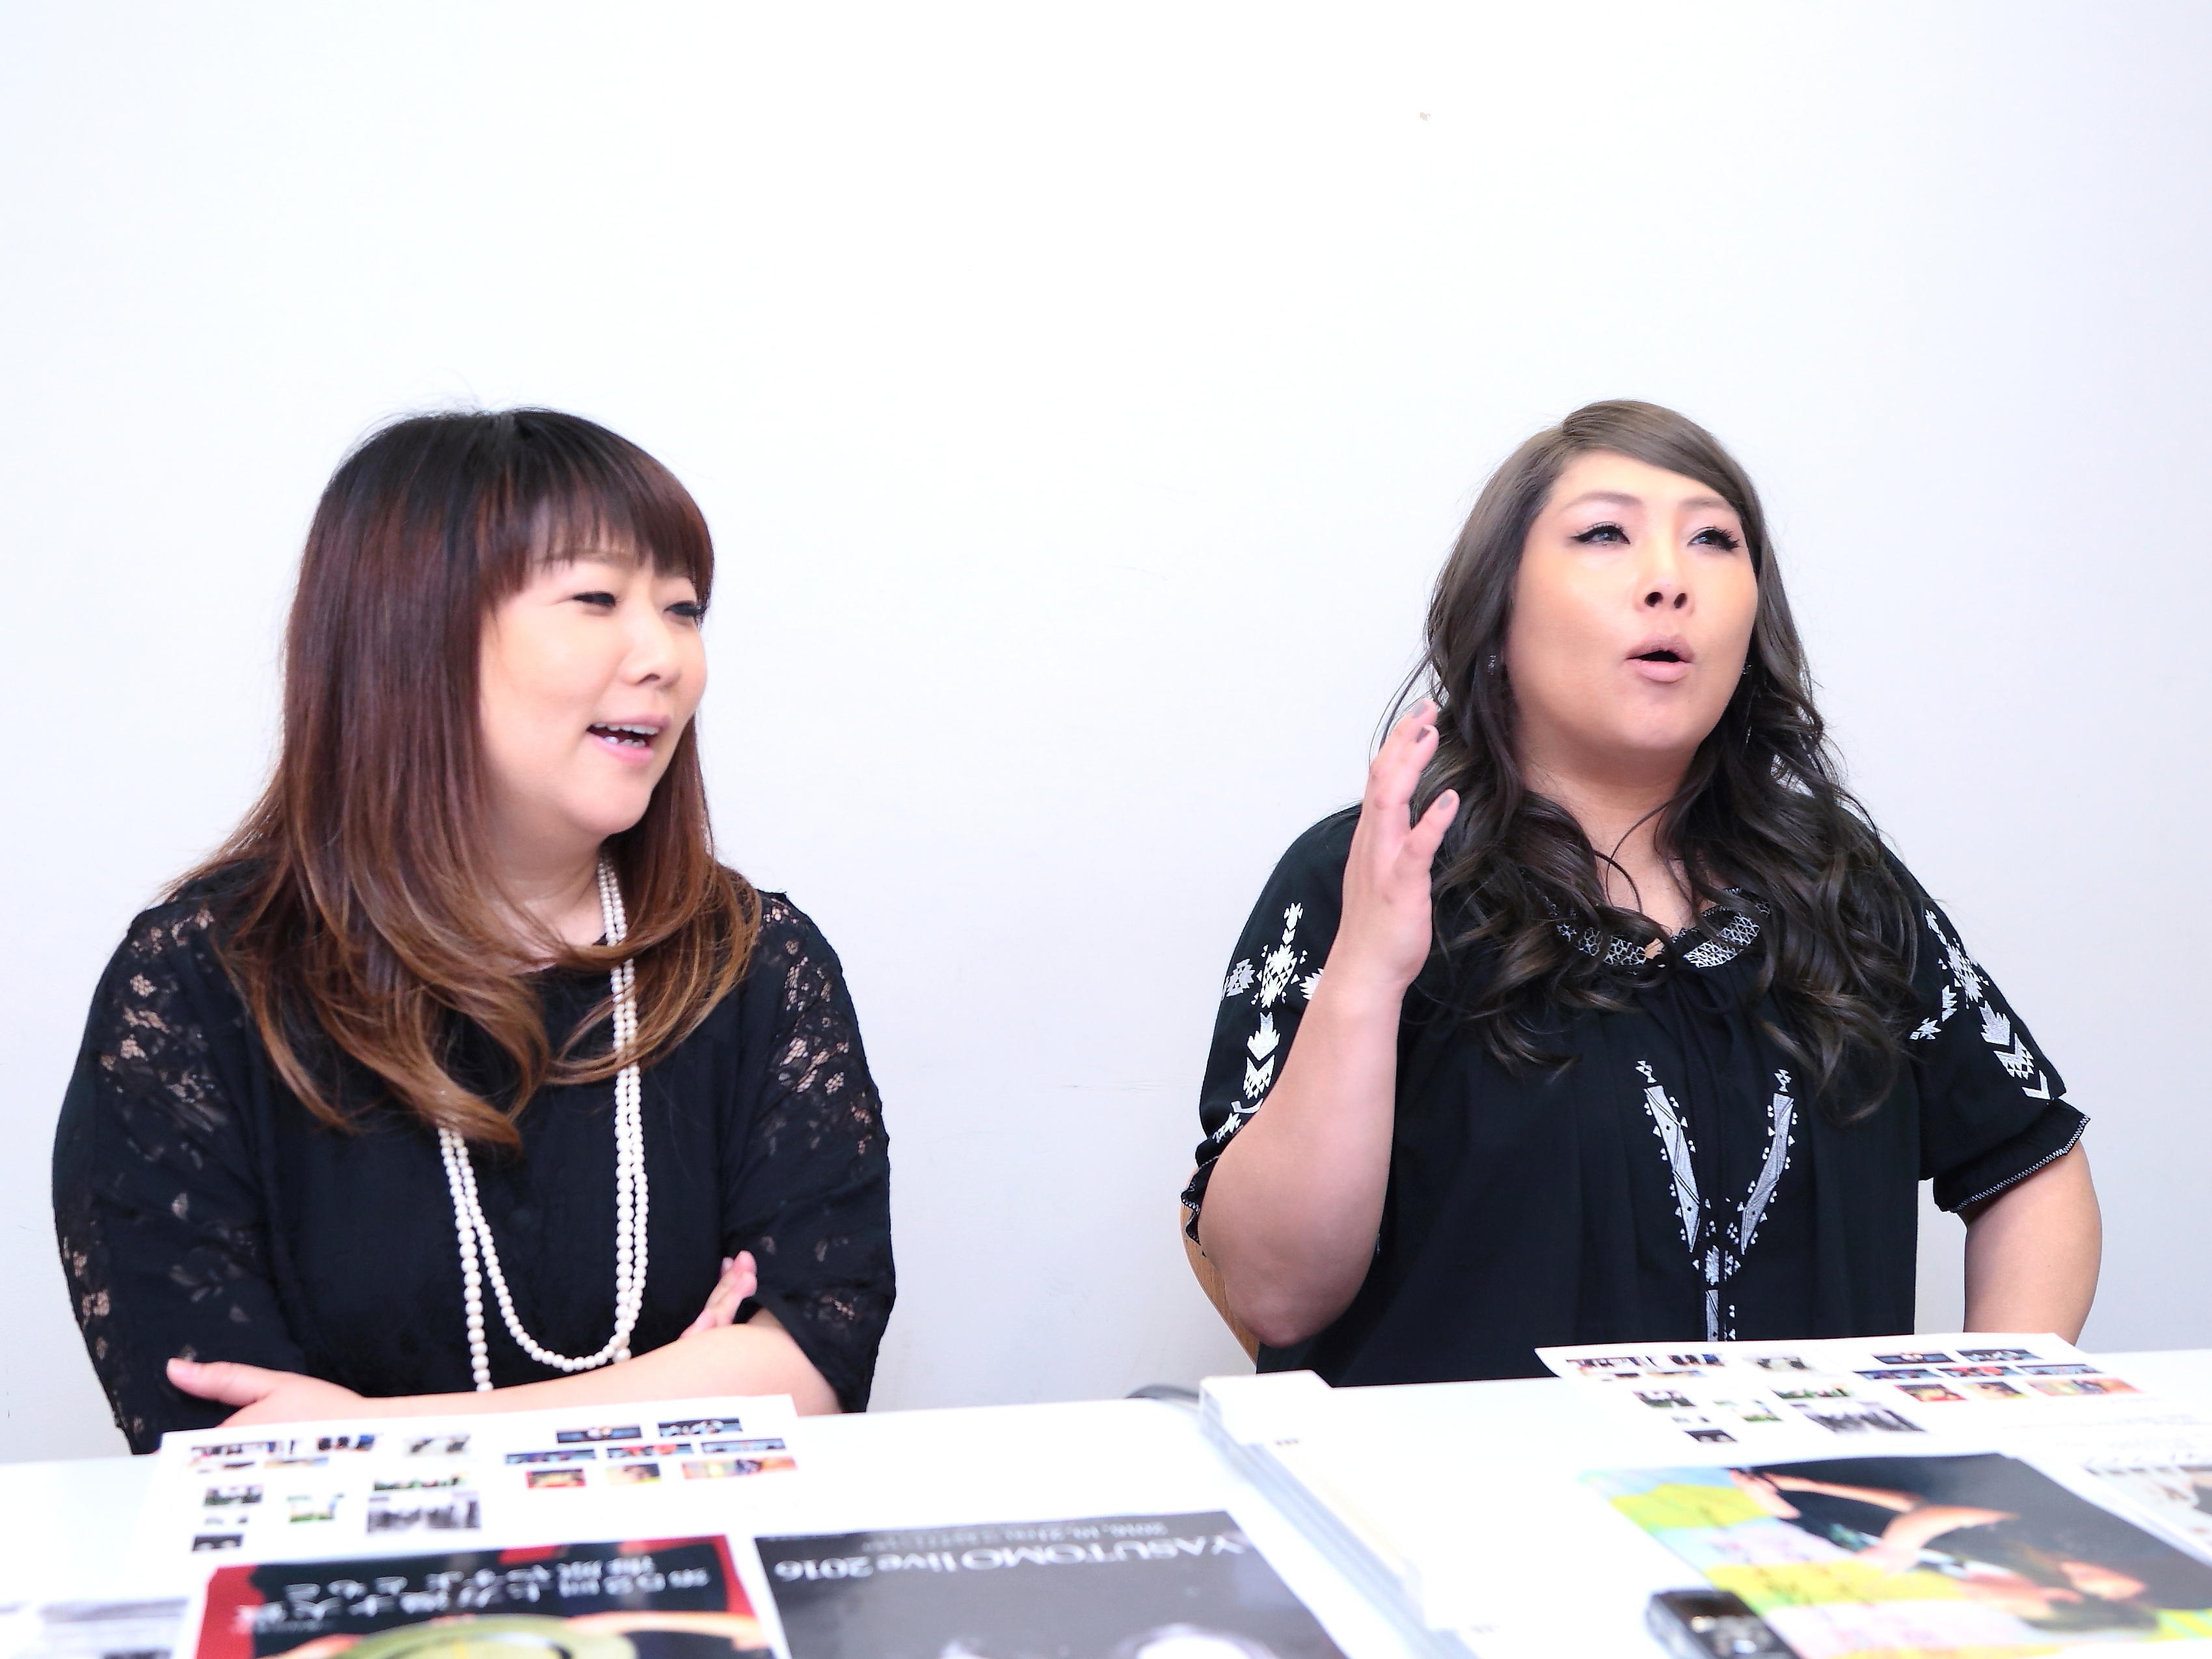 http://news.yoshimoto.co.jp/20170630171306-dc8d2c9c7ae4ae1112ffb9725c179e38808c20a8.jpg